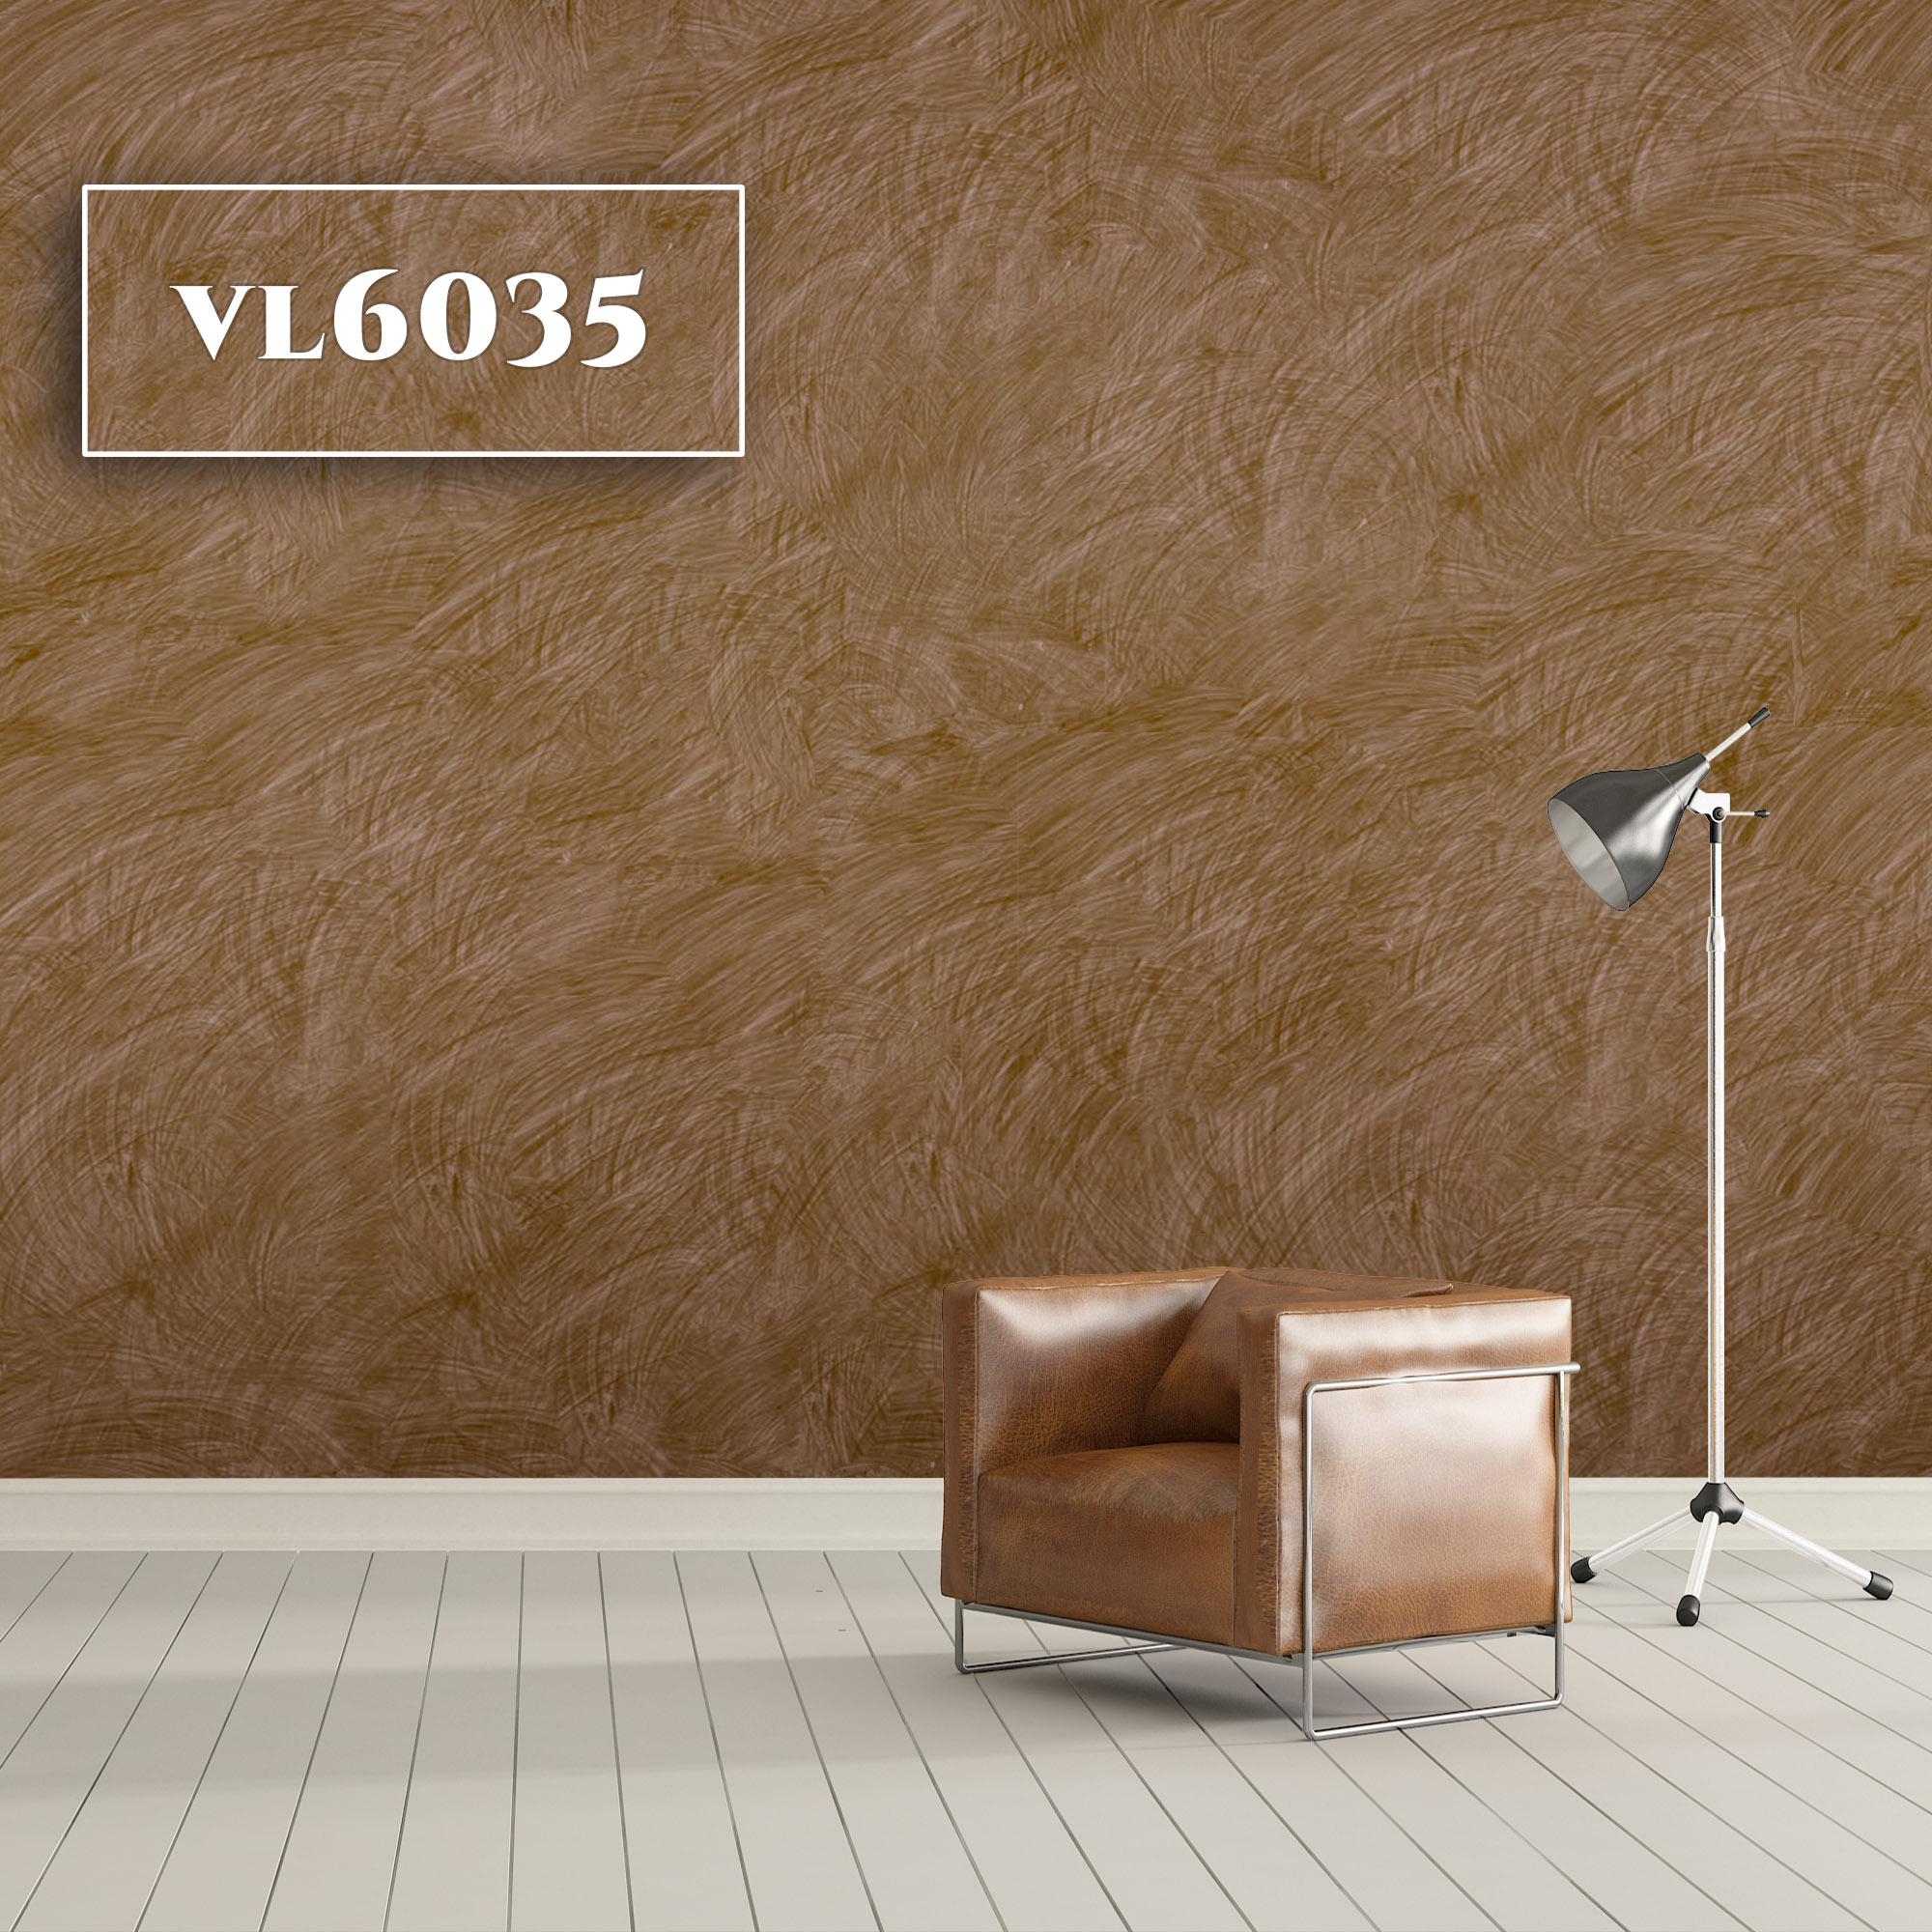 VL6035